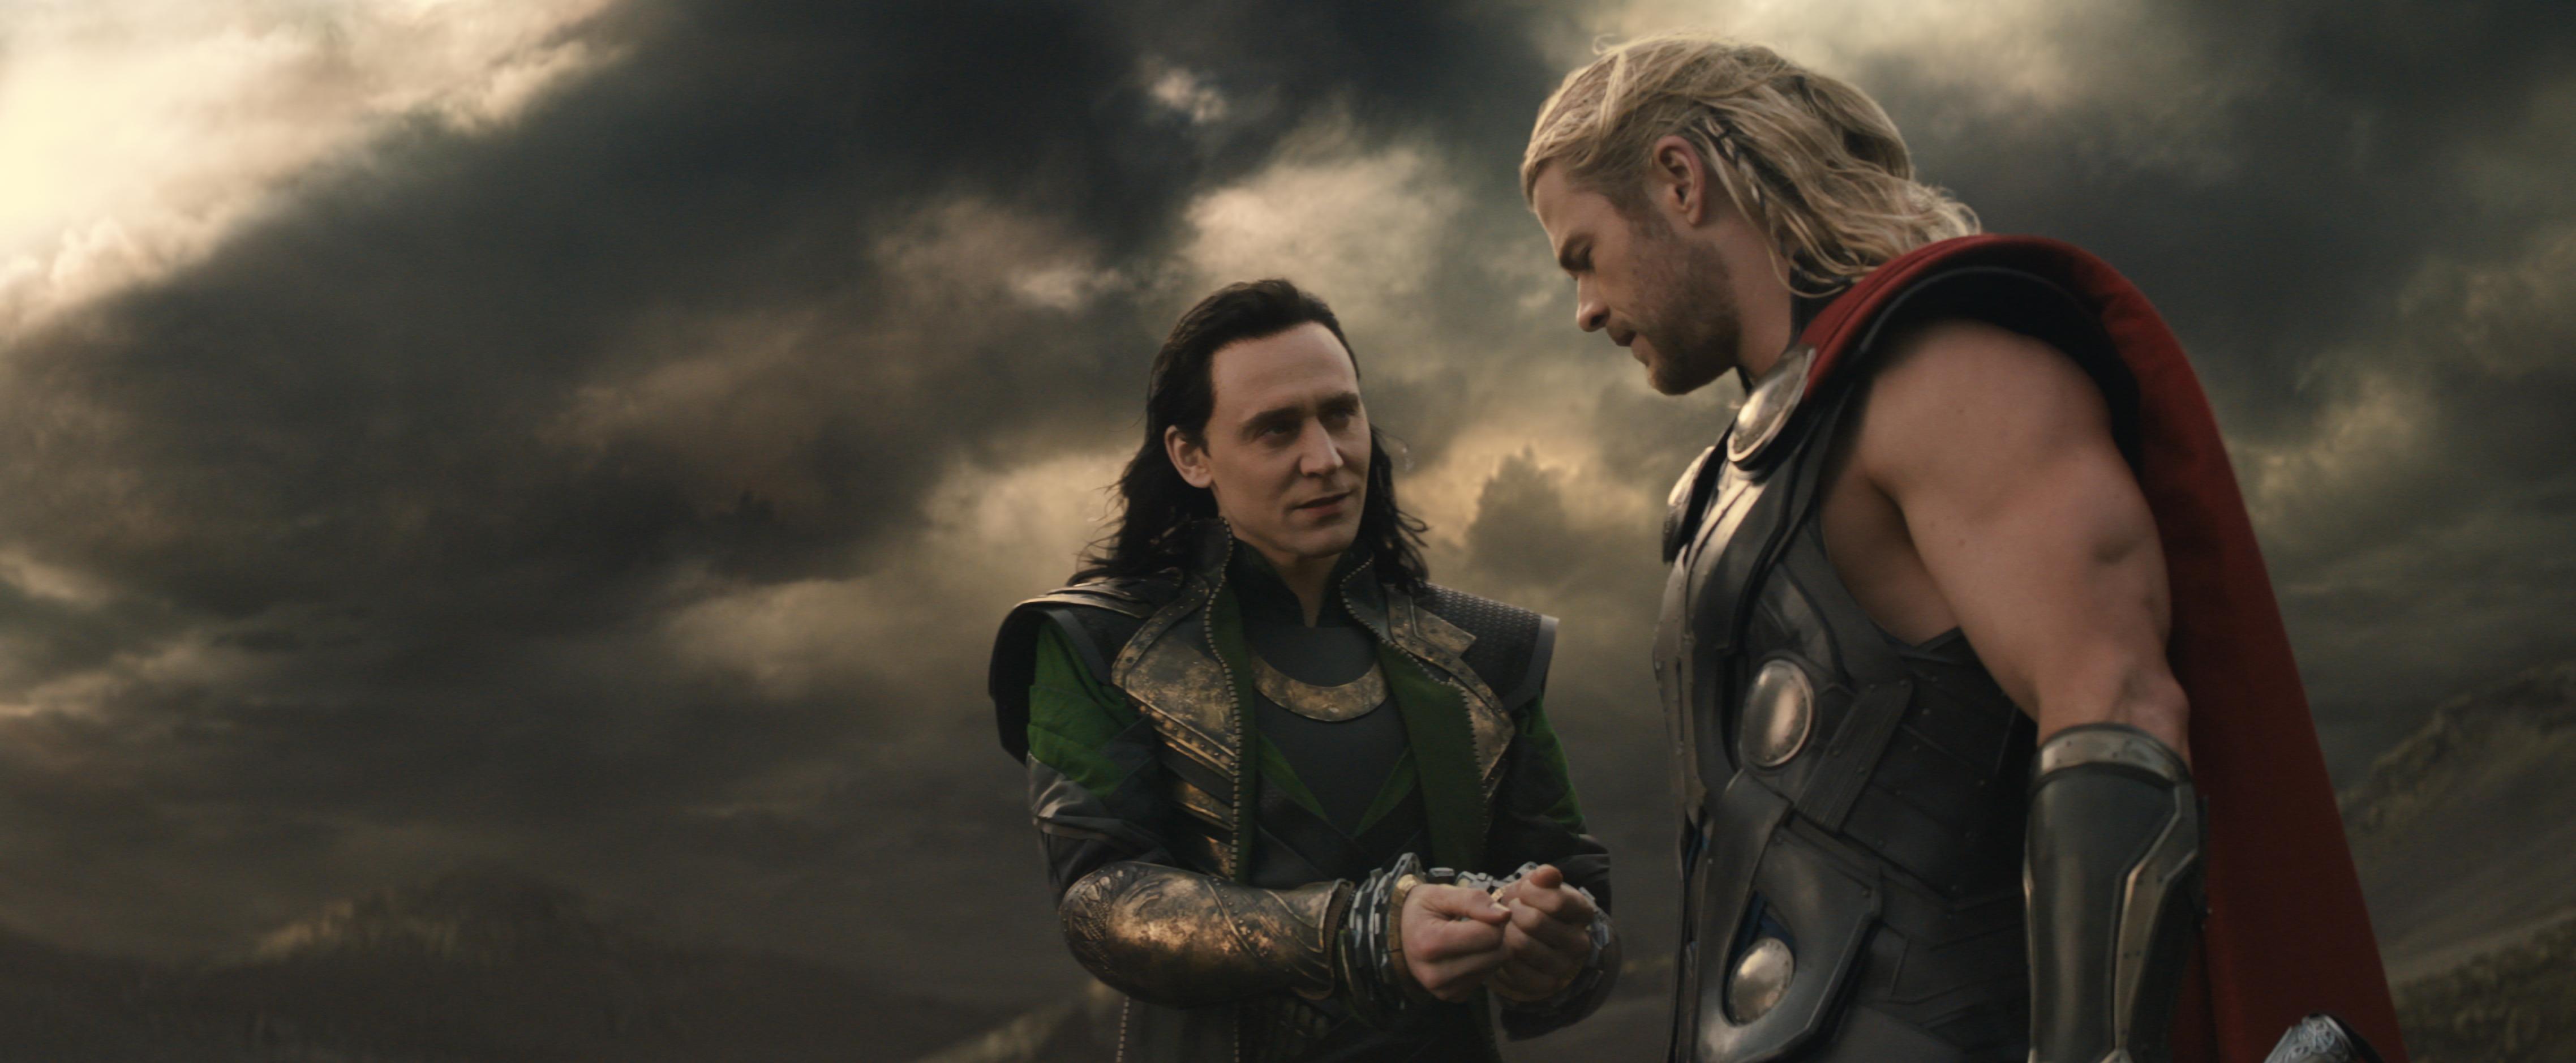 P Thor Temny Svet Cz